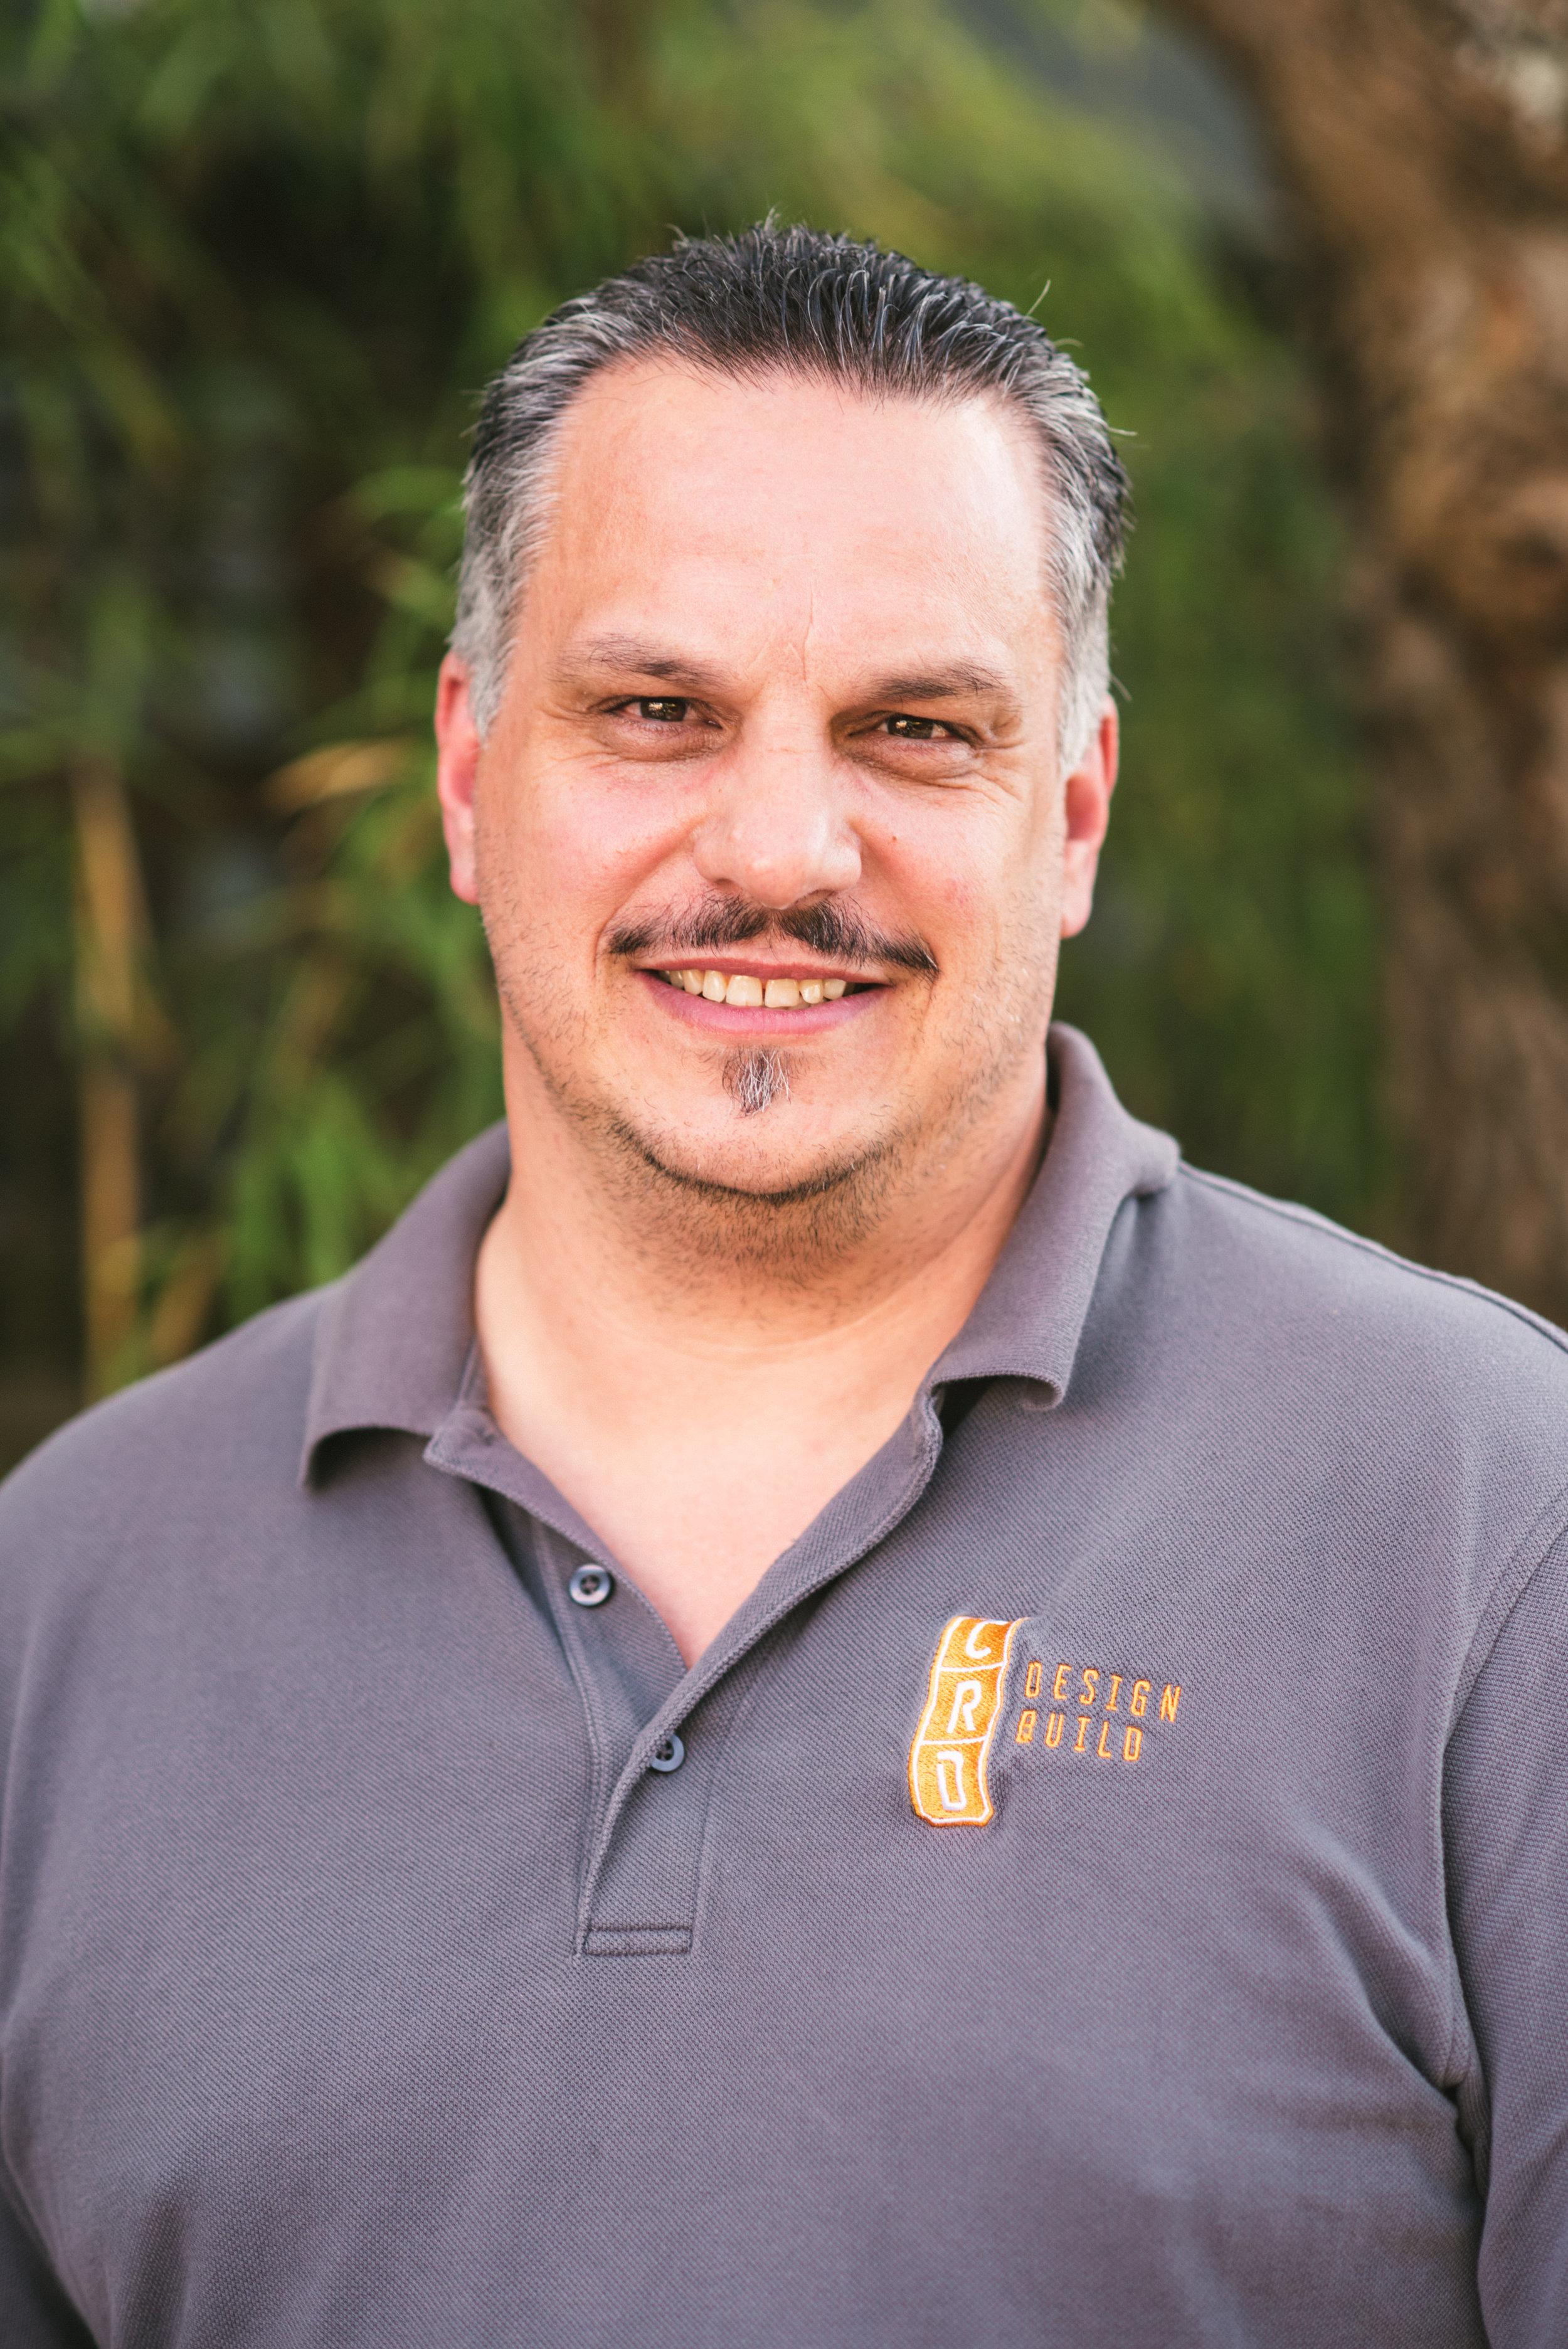 Michael McDermott, Owner/Production Manager